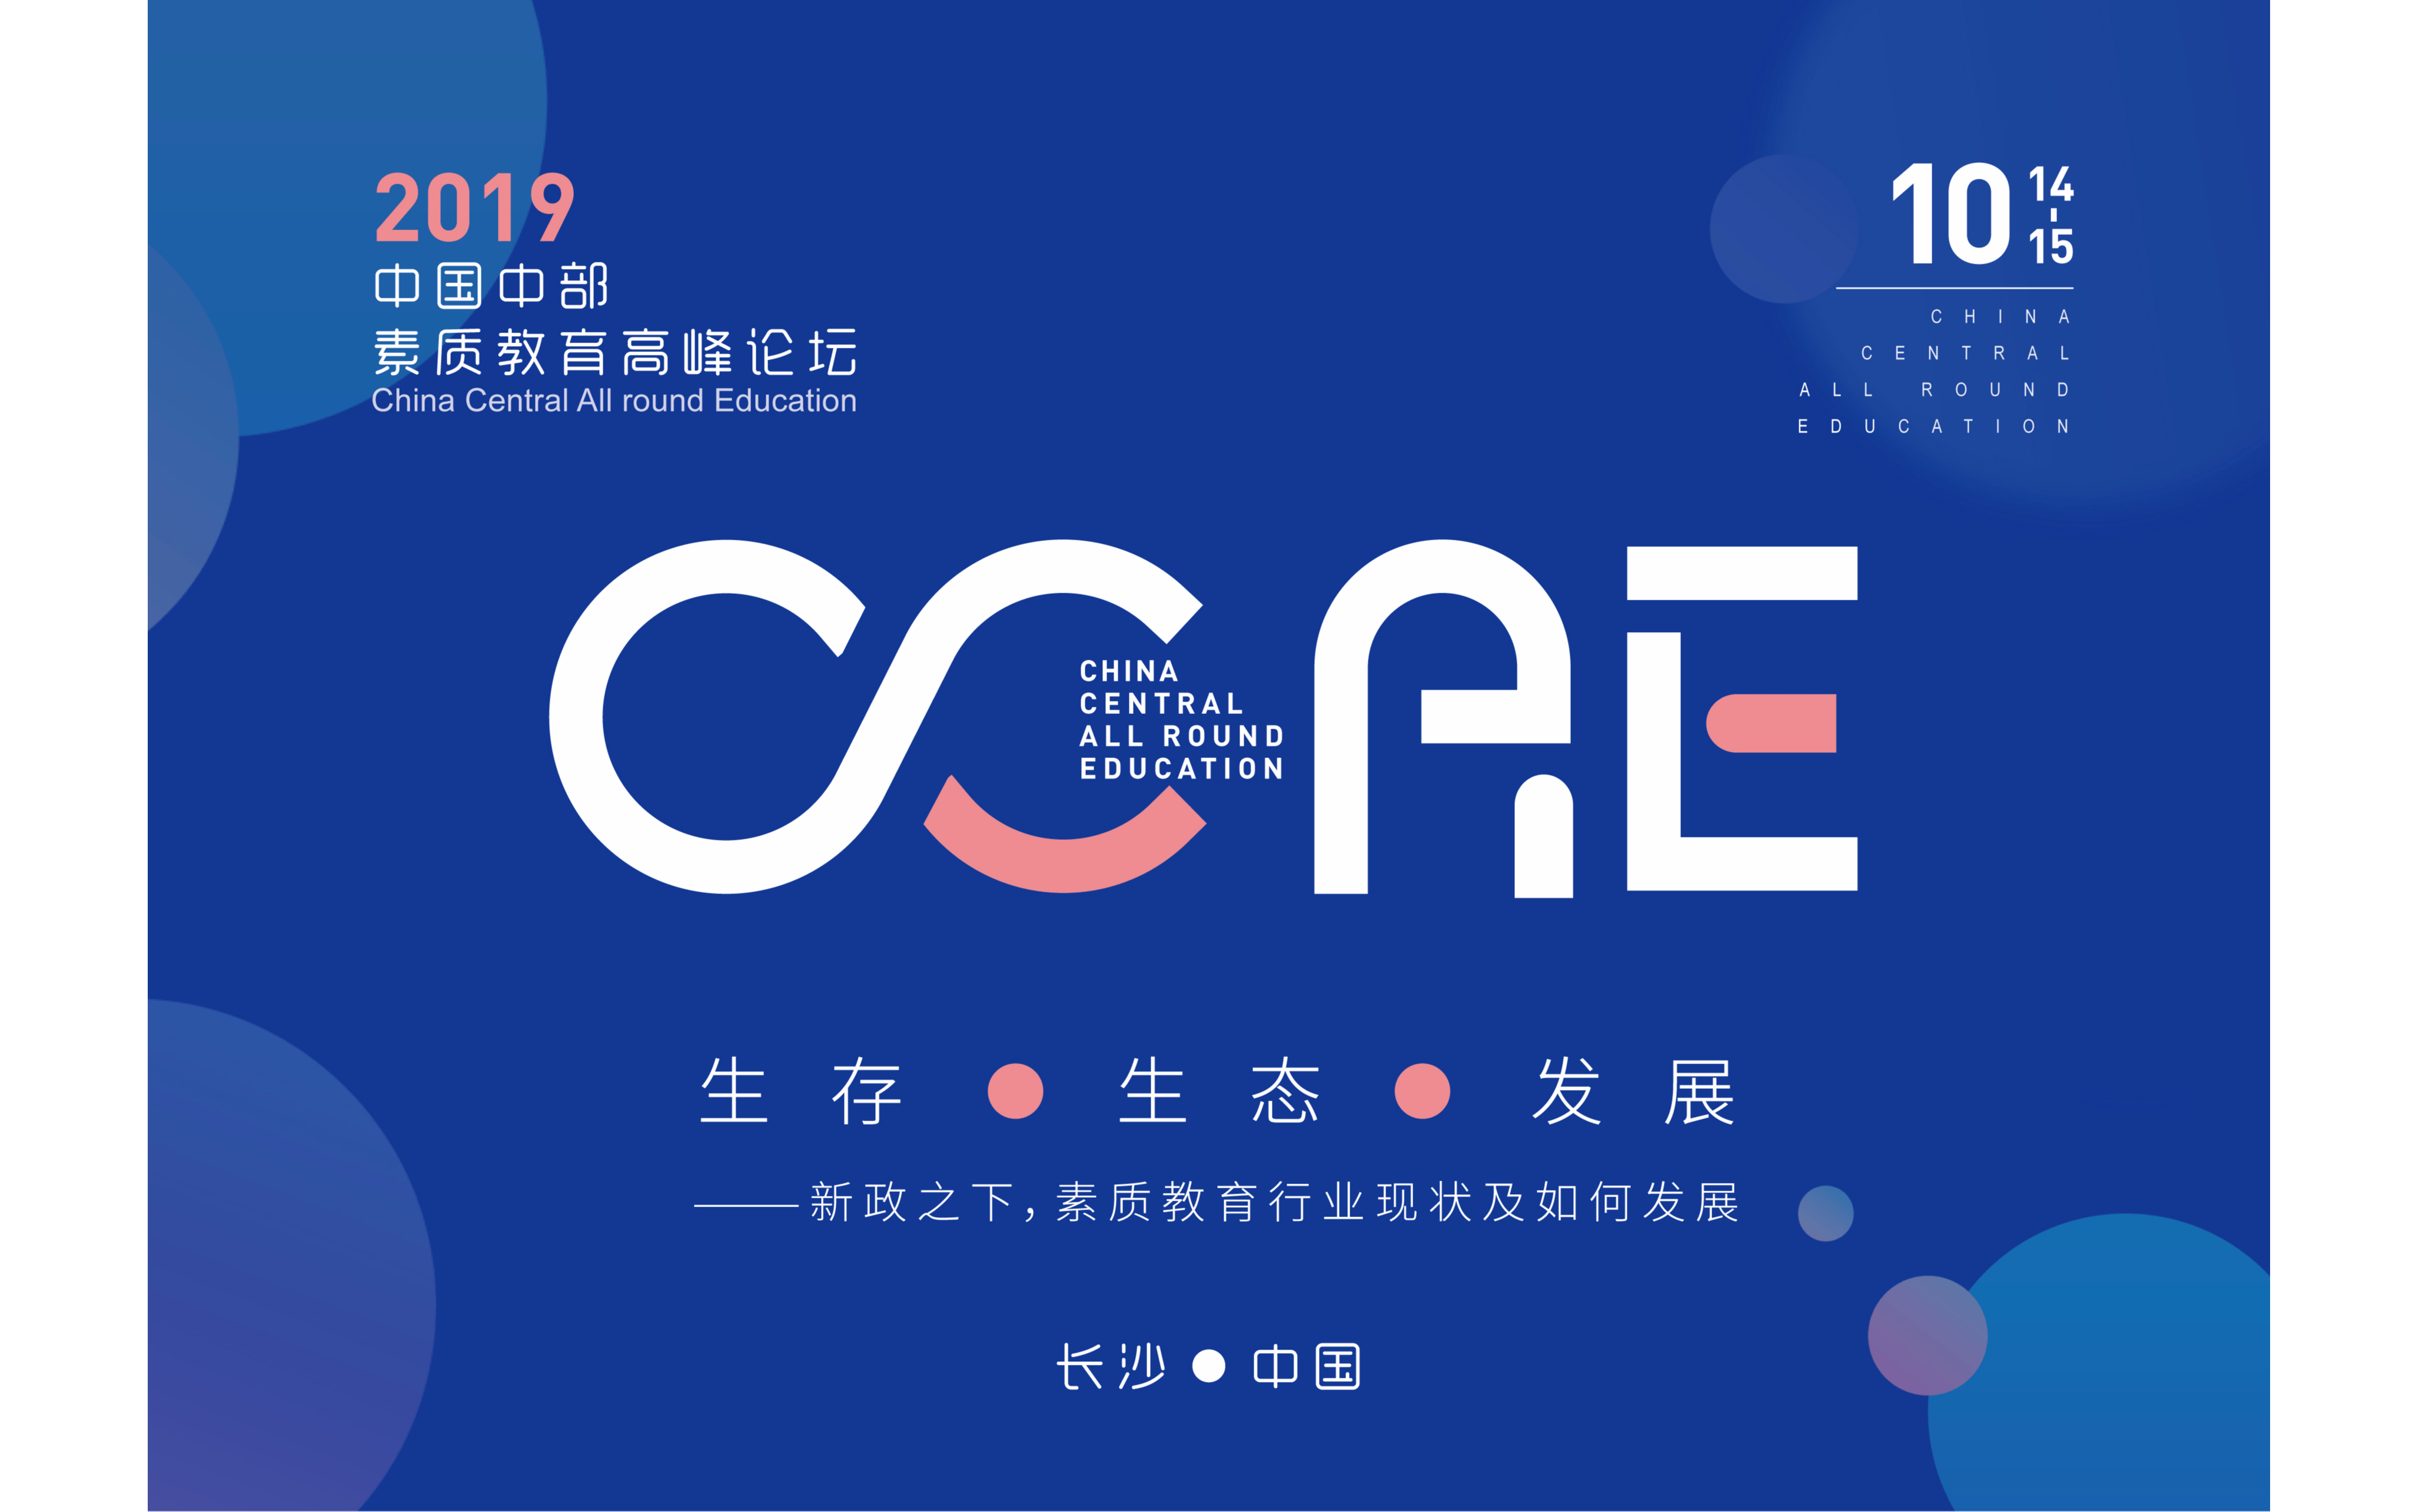 CCAE2019首届中国中部素质教育大会(长沙)